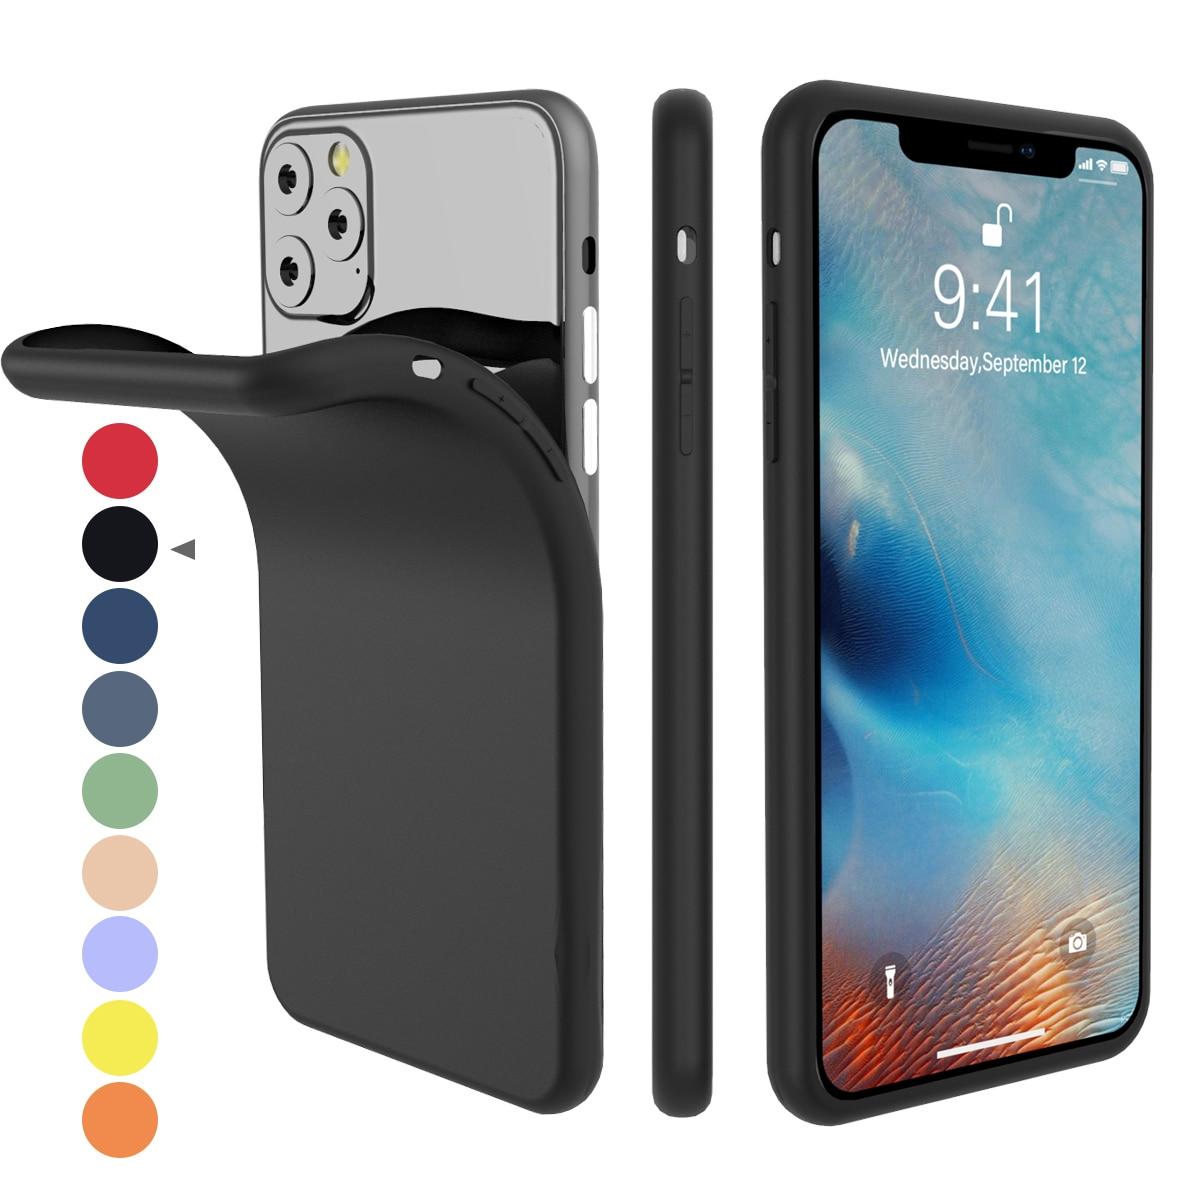 Torubia Silicone Case for iPhone 11/11 Pro/11 Pro Max 40